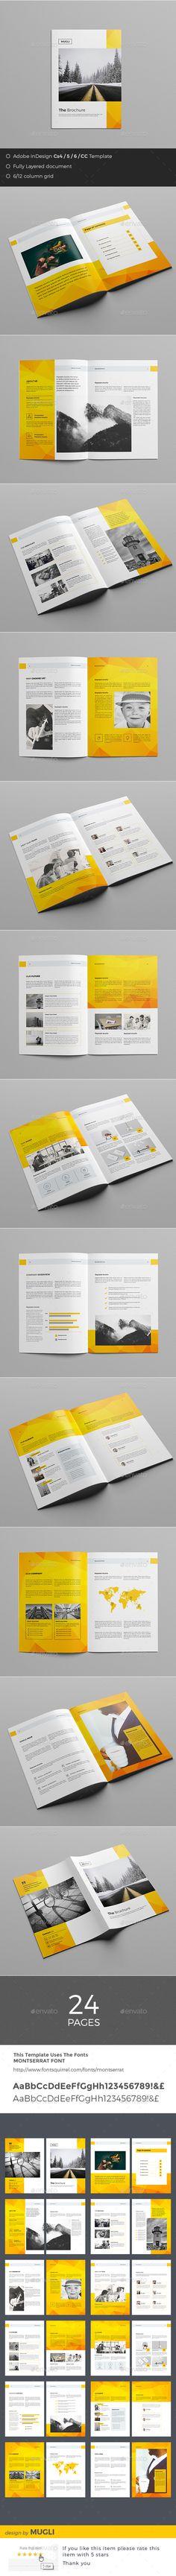 Brochure Template InDesign INDD, AI Illustrator. Download here: https://graphicriver.net/item/brochure/17475059?ref=ksioks